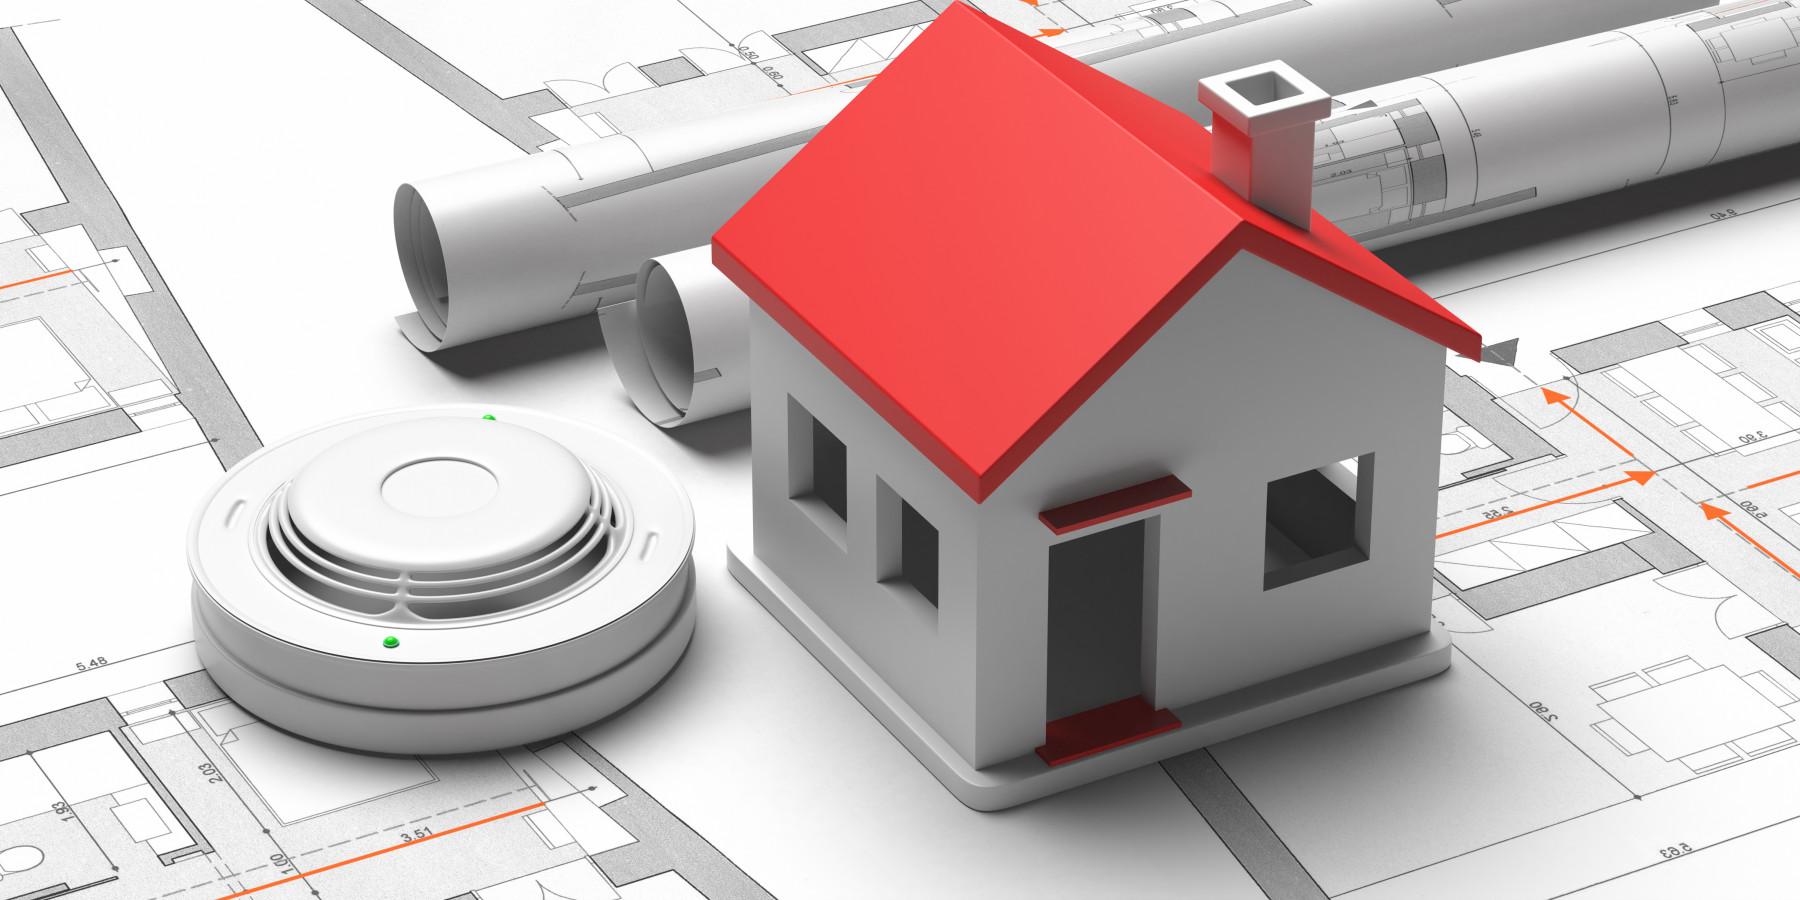 Home Service Safety Plan - Tim Kyle